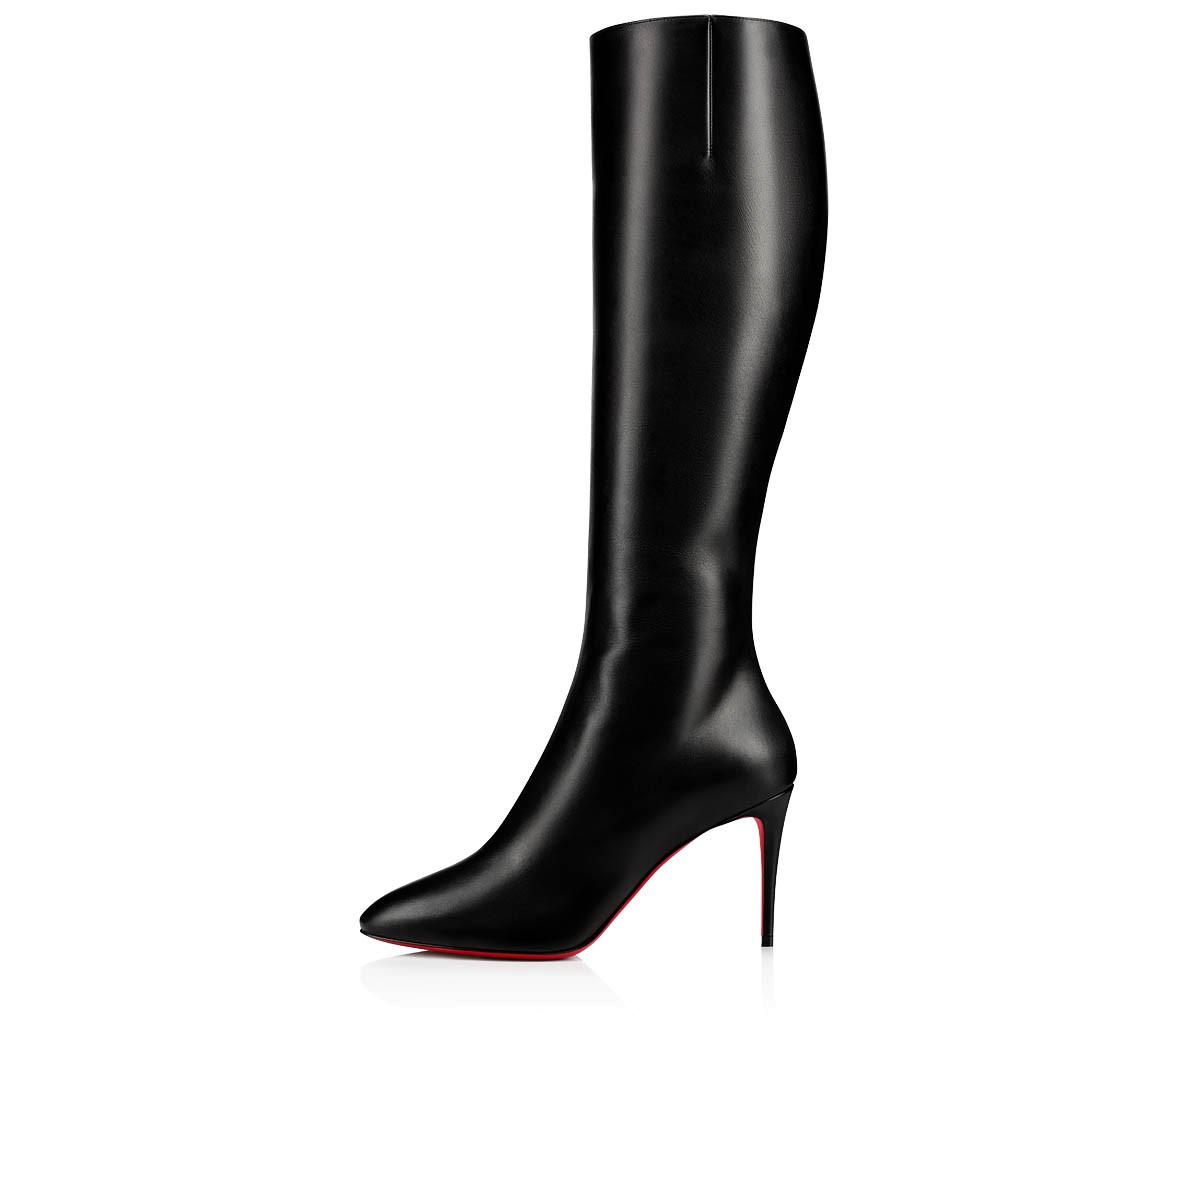 Shoes - Eloise Botta - Christian Louboutin